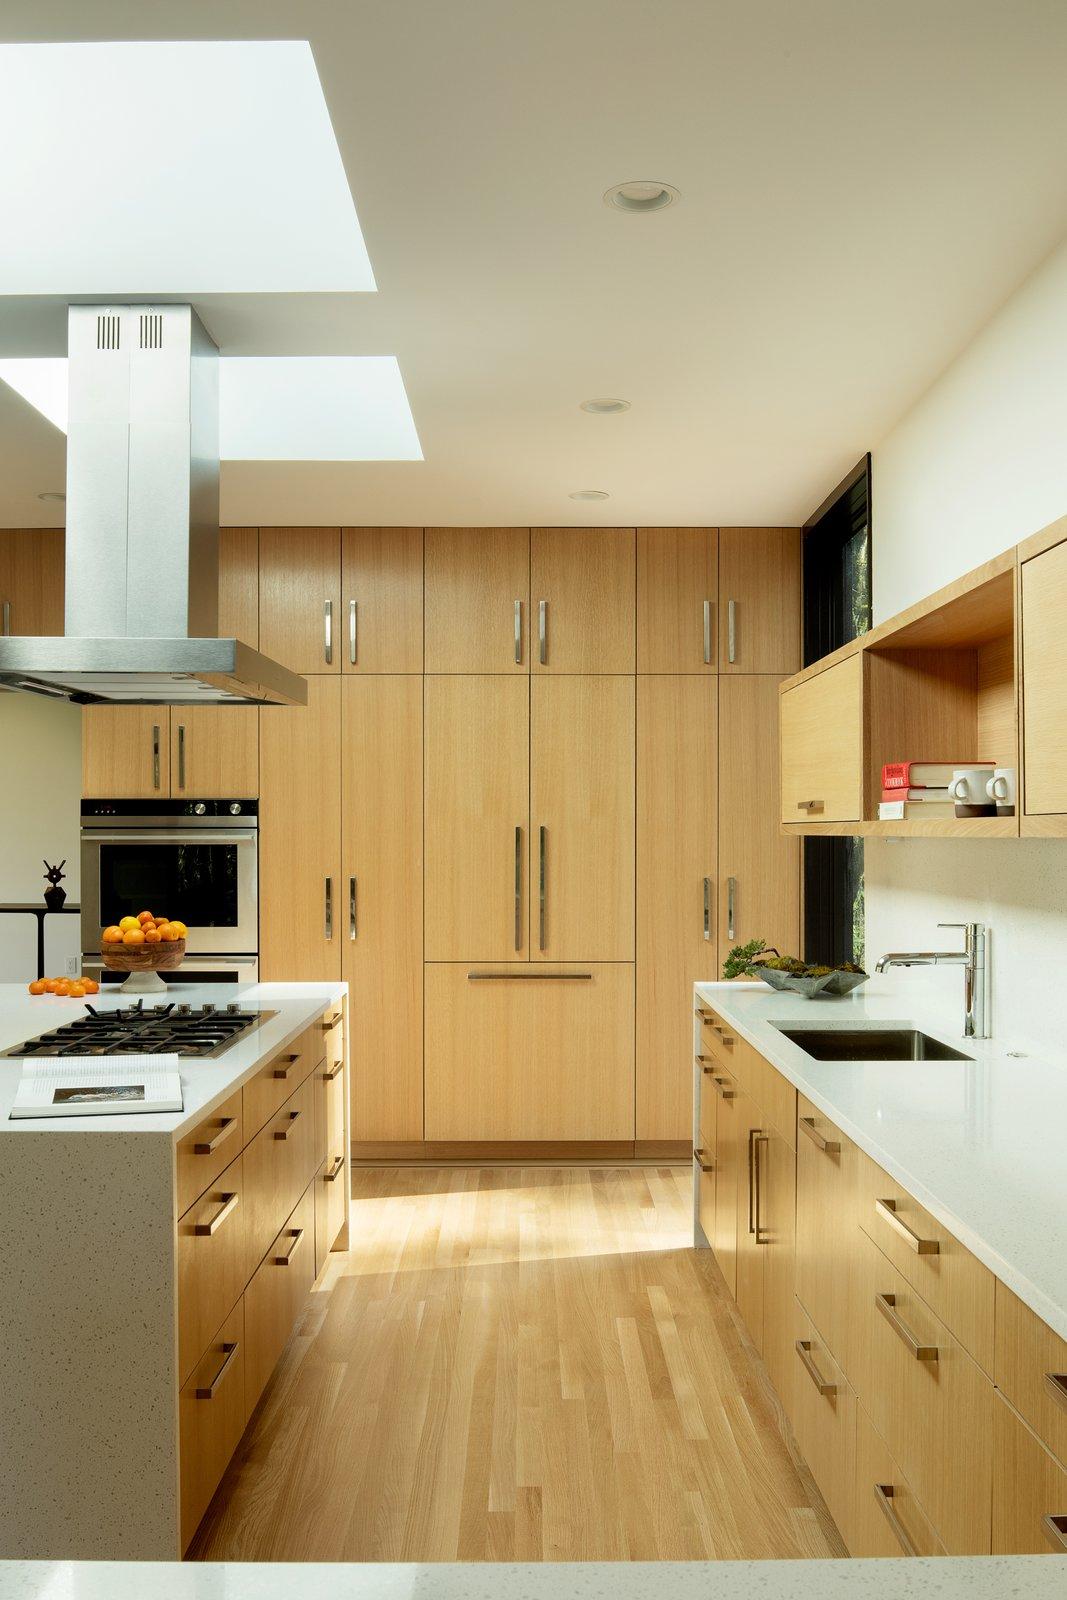 William / Kaven Architecture Royal Portland, Oregon Forest Park kitchen